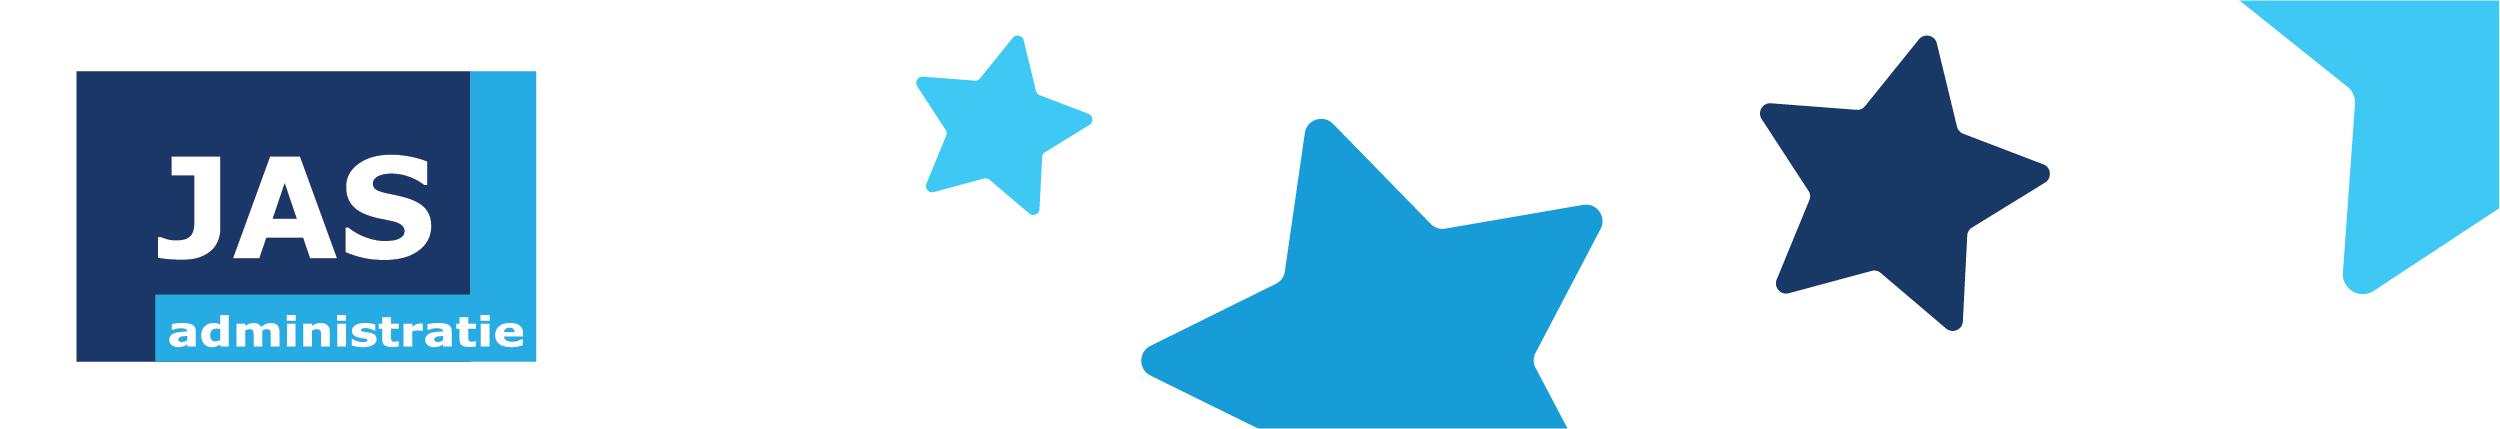 Logo JAS-ASdministratie